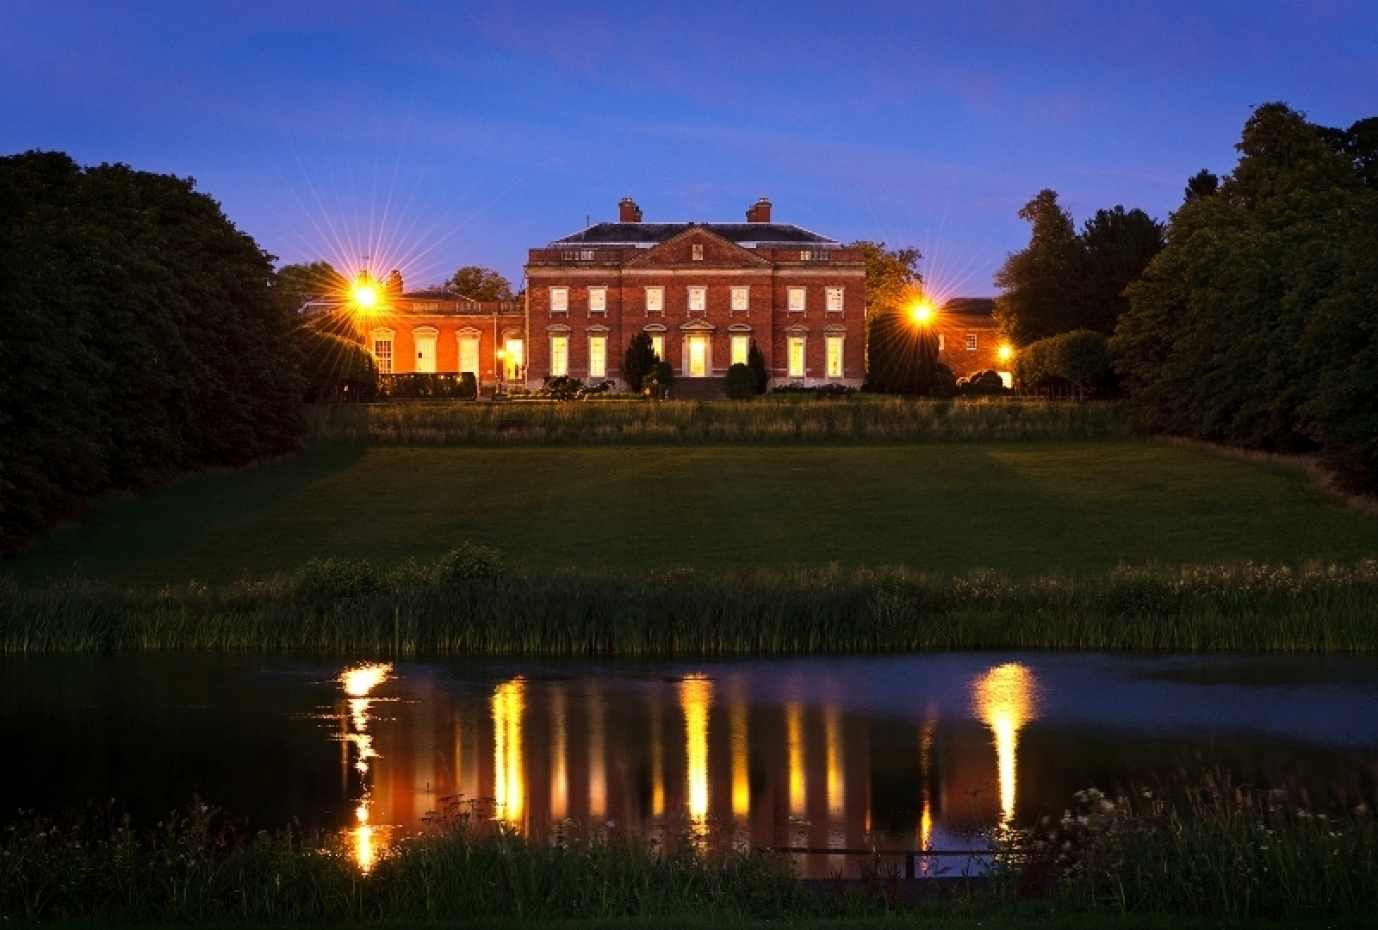 Kelmarsh Hall by night